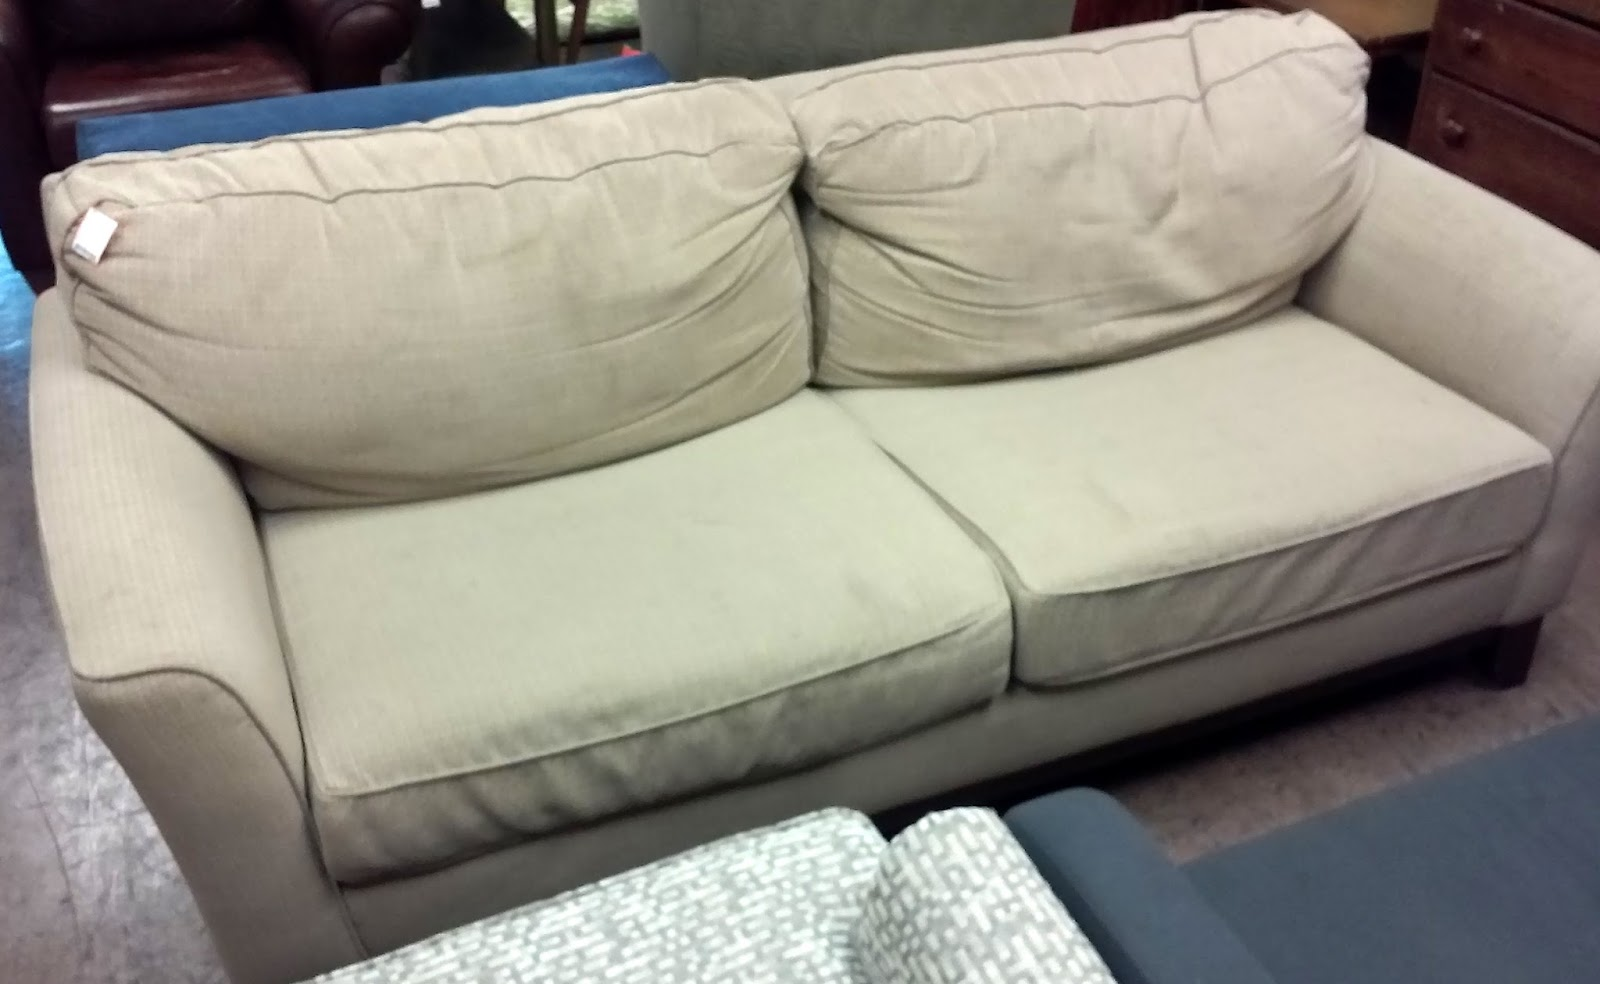 Sold Clearance 8027 Sklar Peppler 7 Sofa Was 50 Now 35